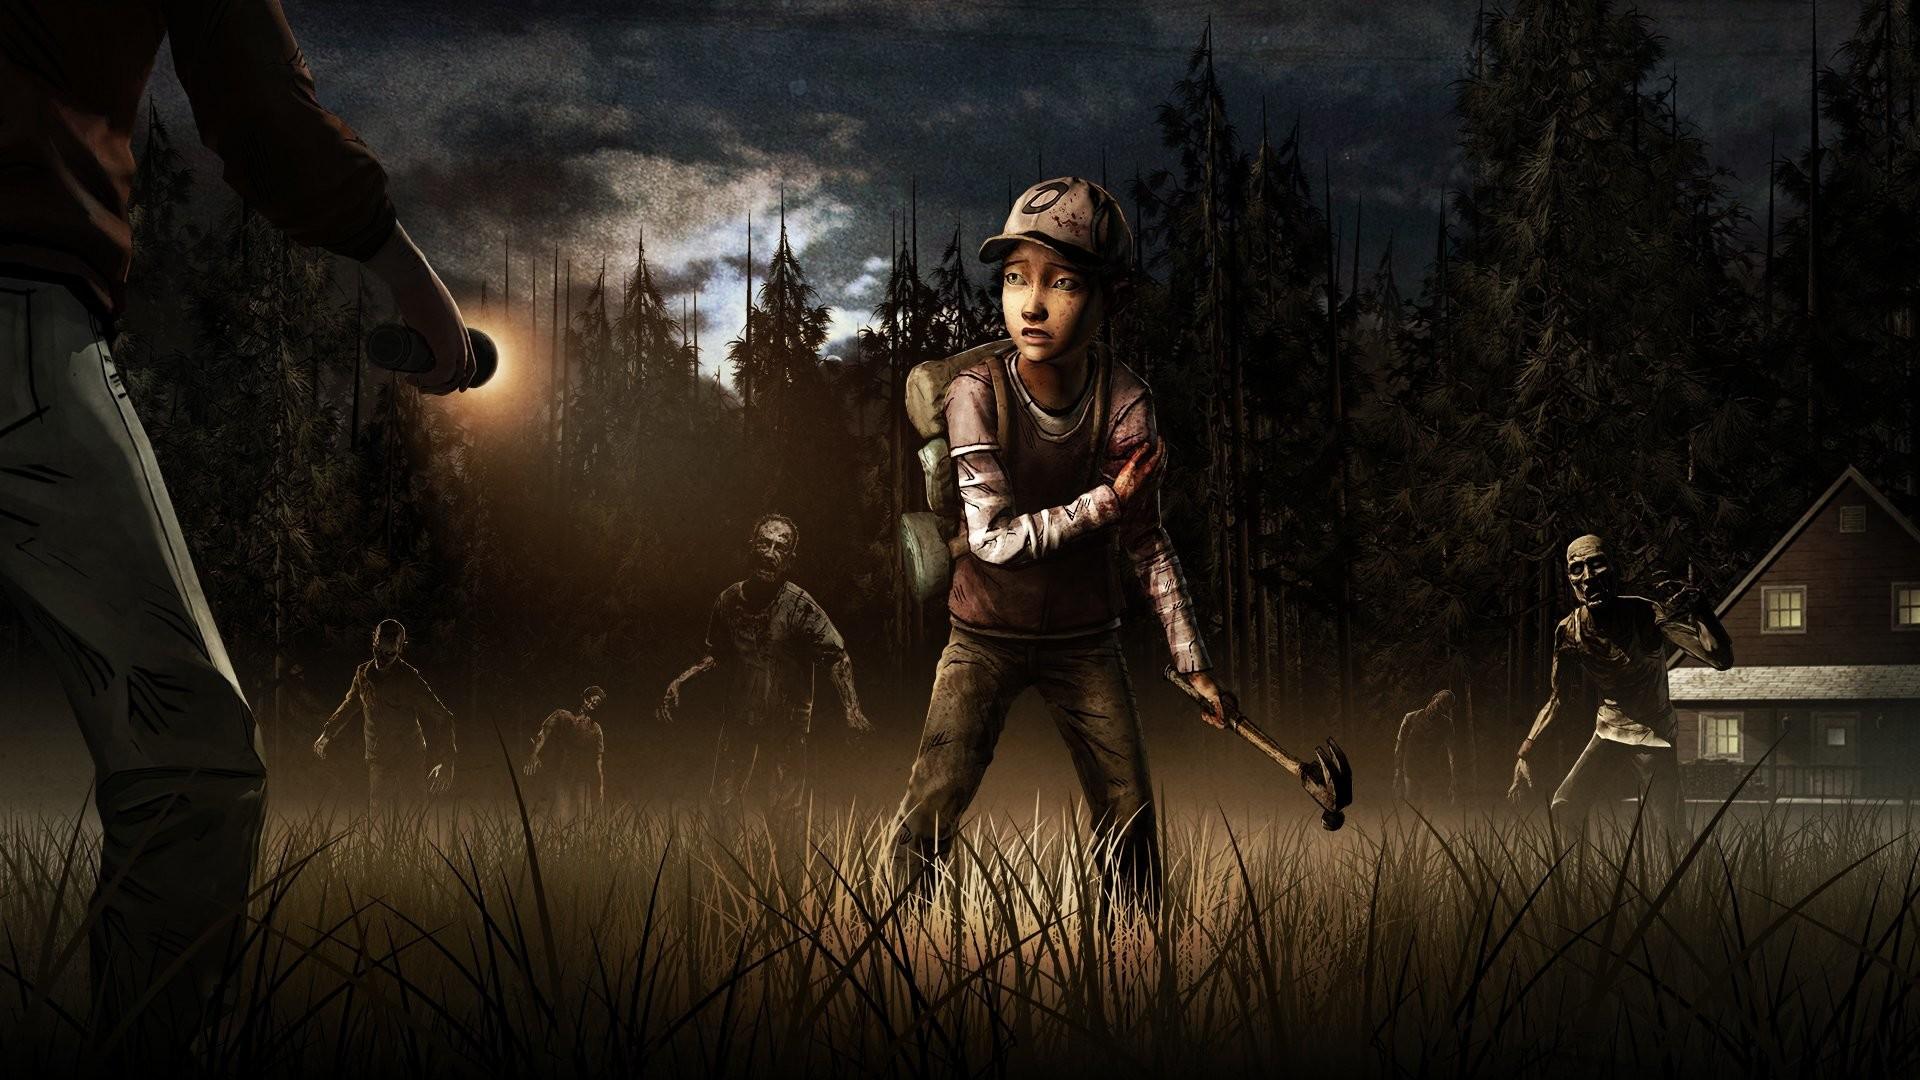 The Walking Dead Wallpaper Hd 73 Images